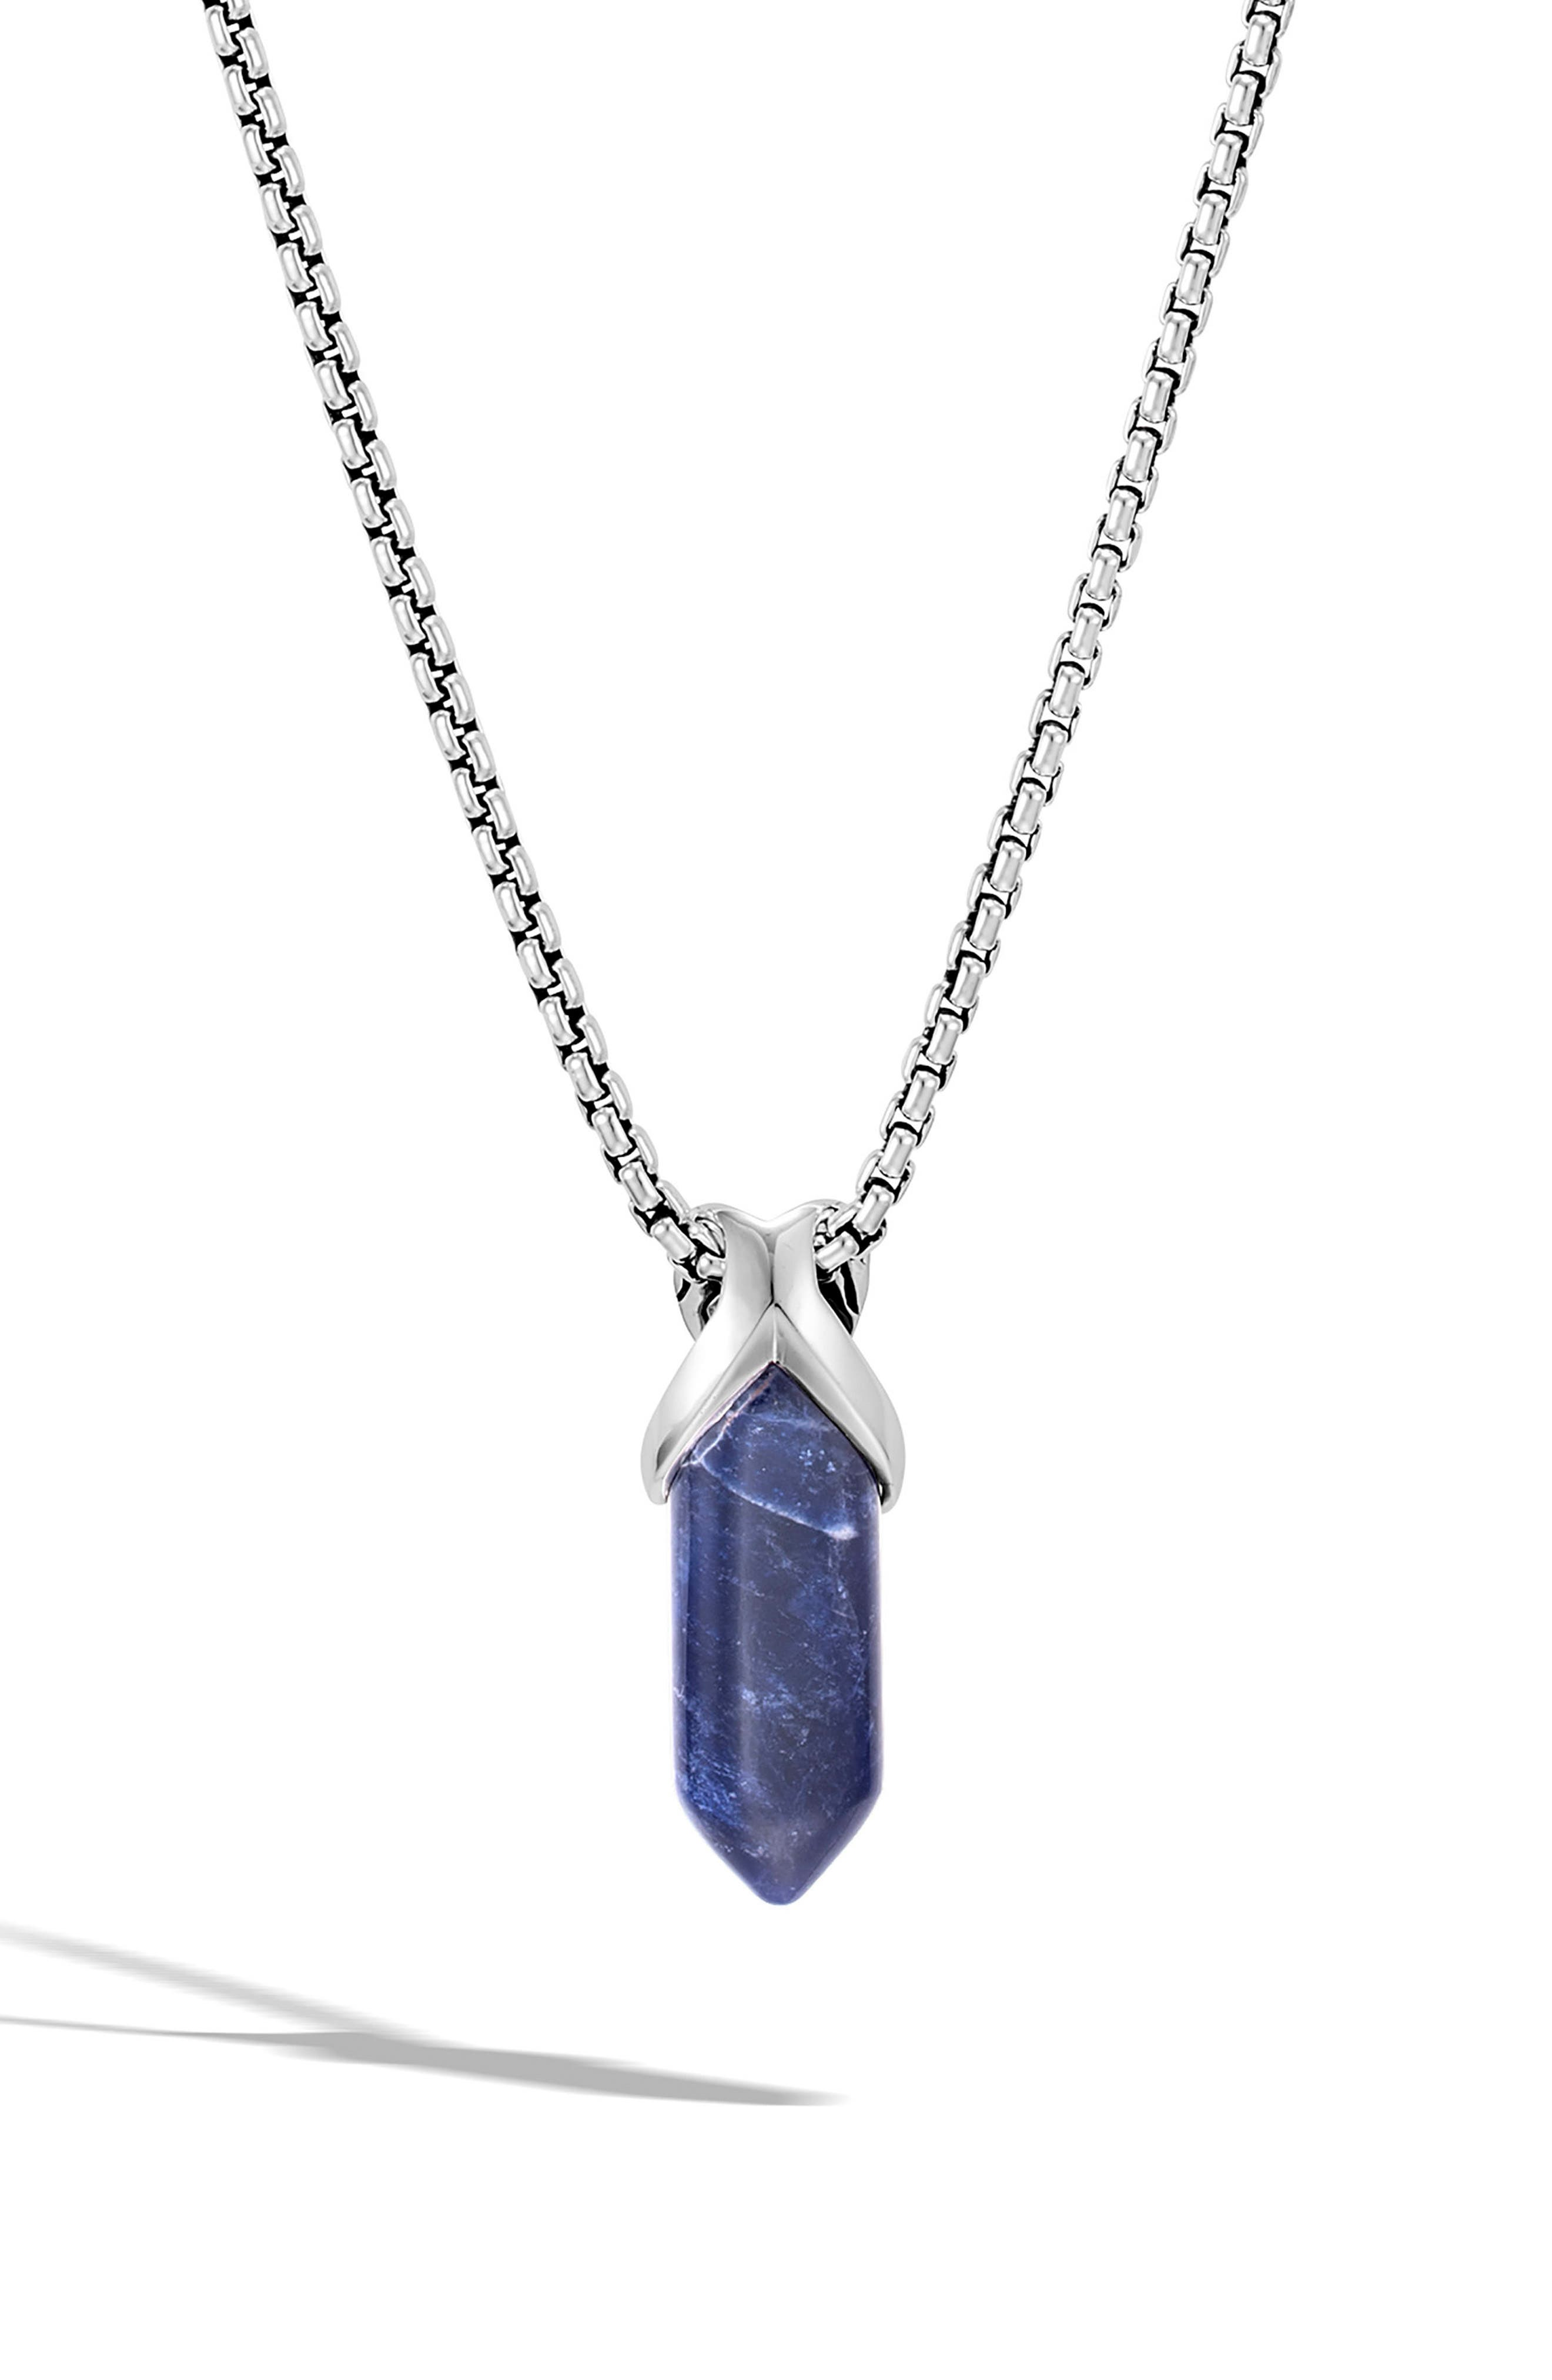 Men's Asli Classic Chain Reversible Pendant Necklace,                             Main thumbnail 1, color,                             SILVER/ SODALITE